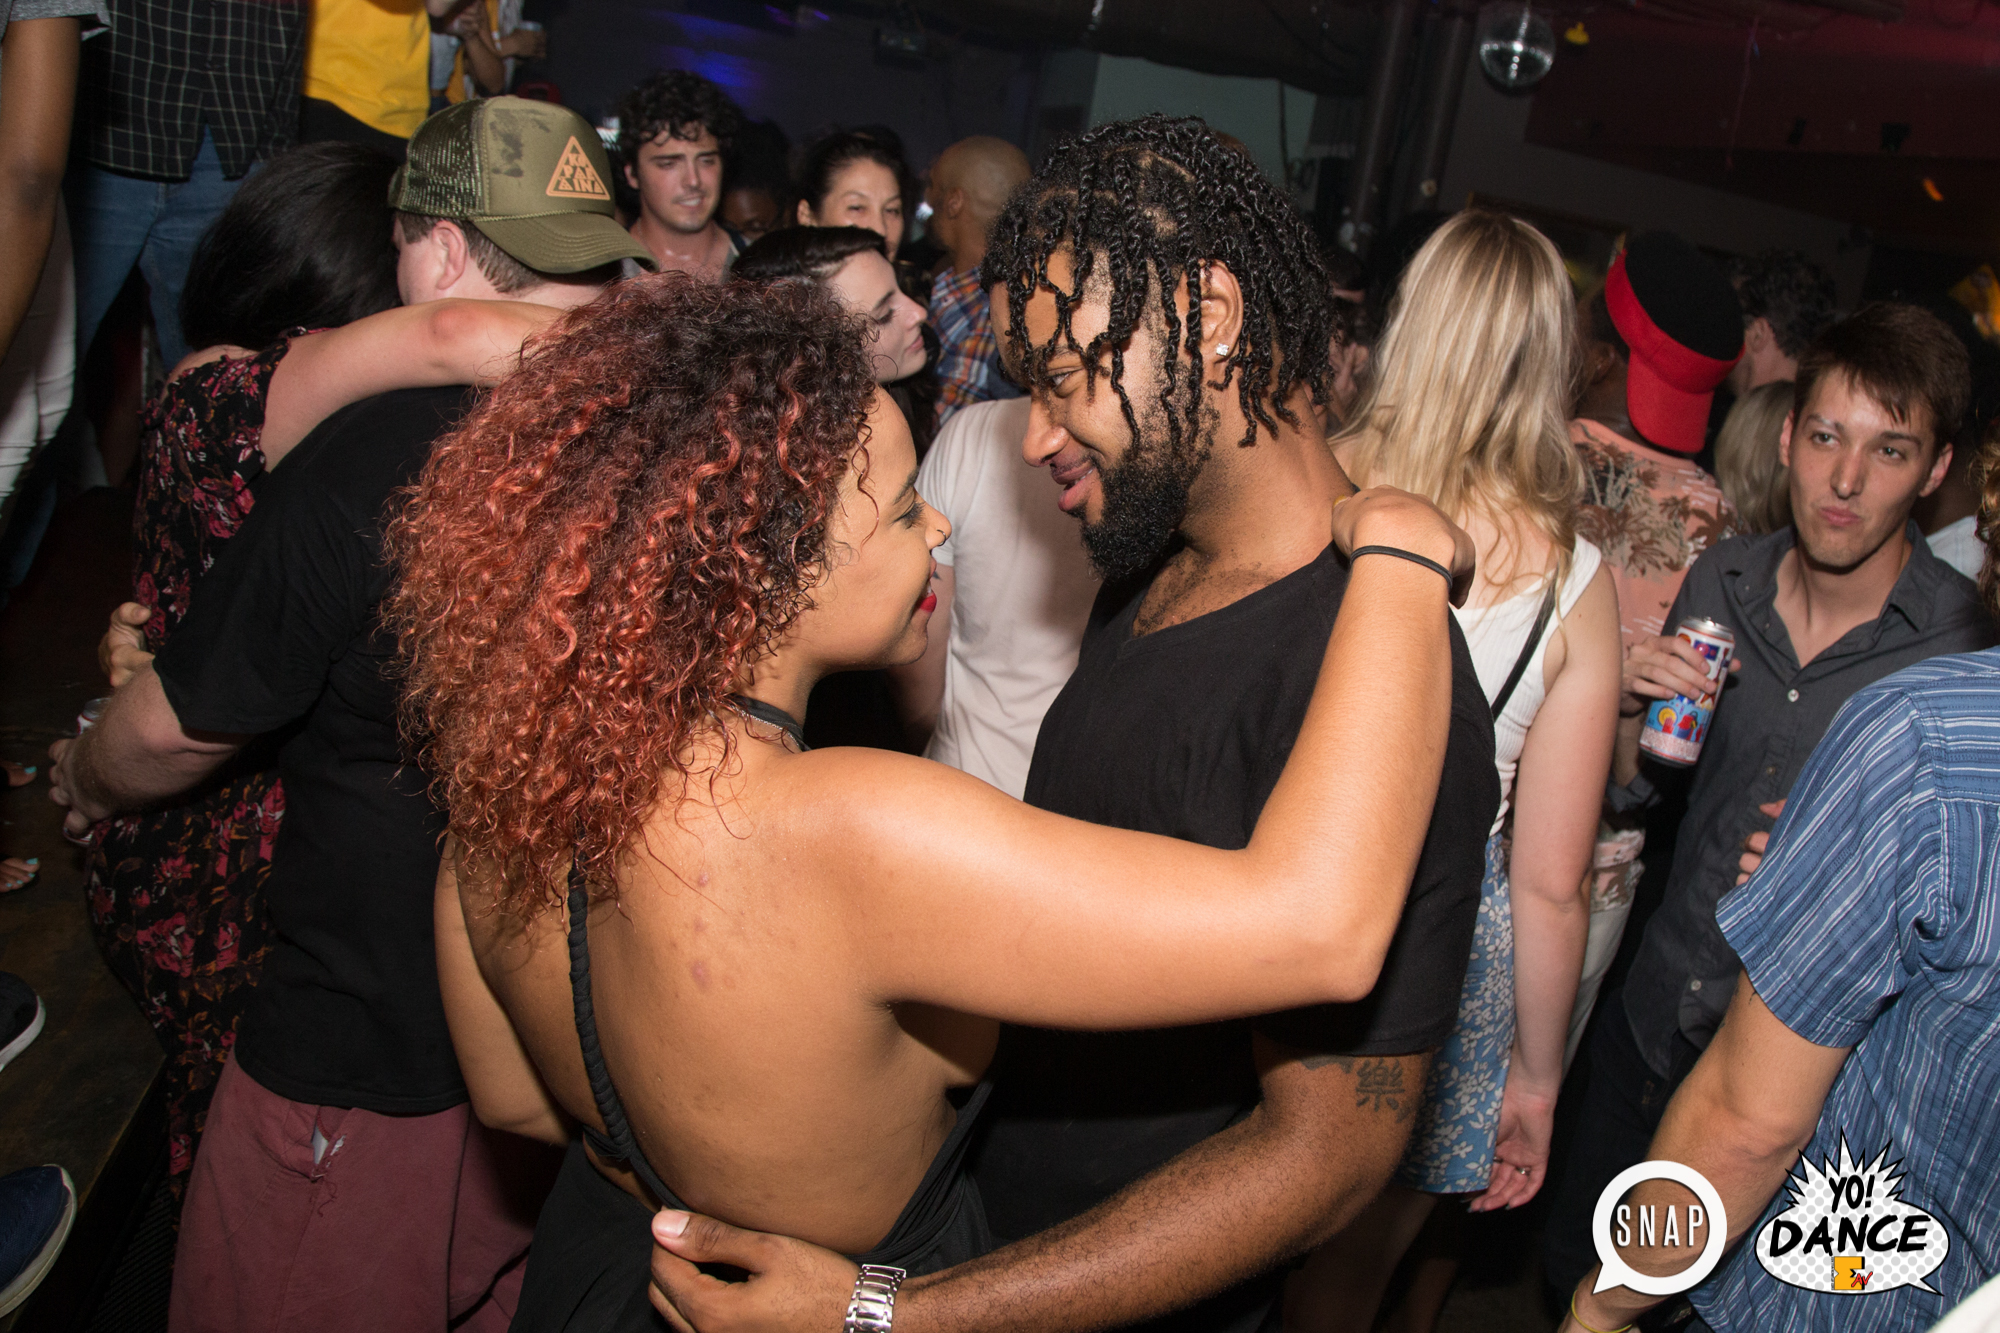 49Yo Dance Oh Snap Kid Atlanta.jpg